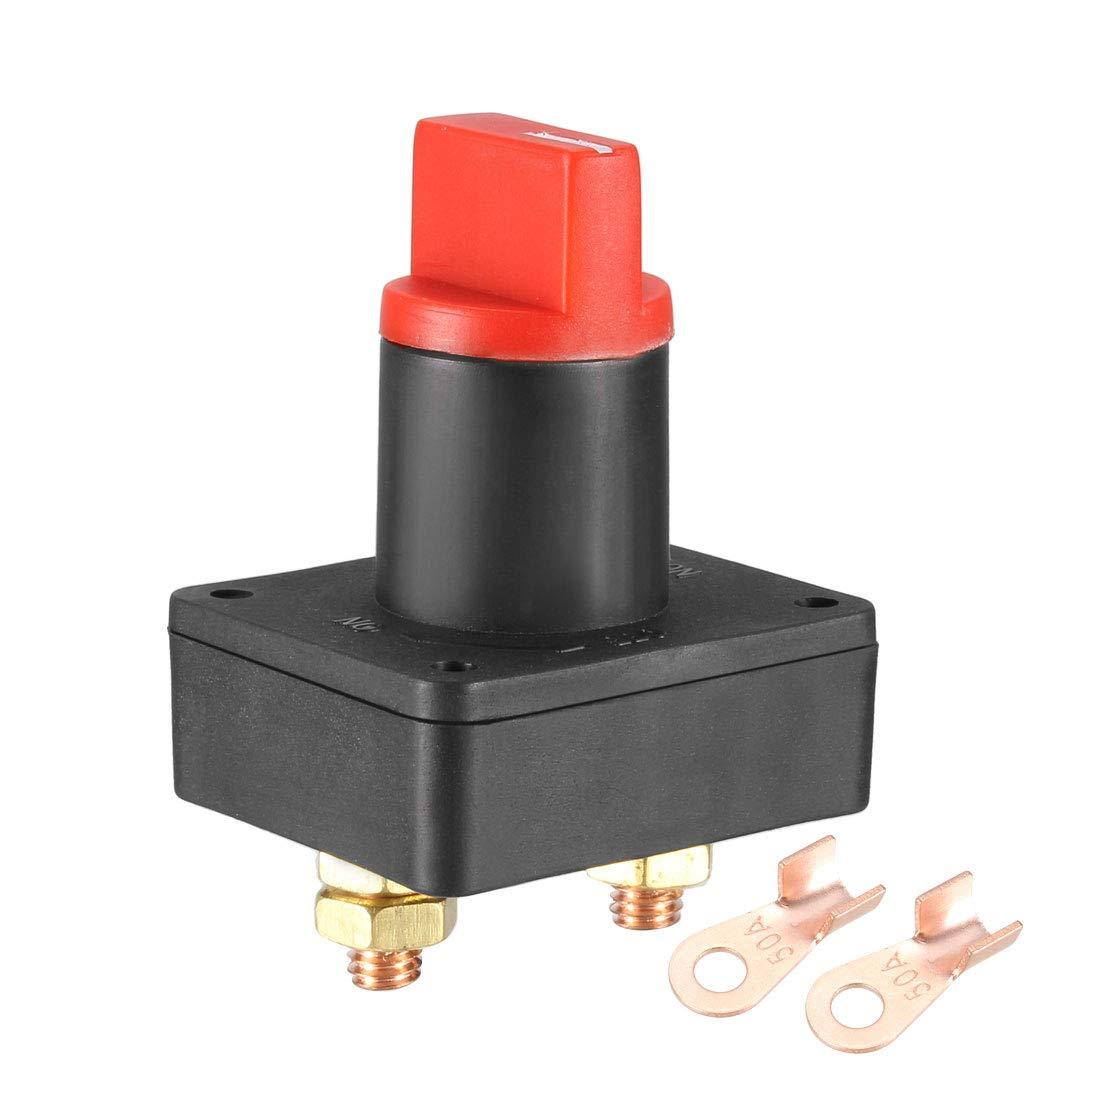 sourcing map Batterie Trennschalter 12-24V Batterie Stromausfall Meister Schalter Isolator Ein Aus mit 2 Klemme Anschl/üsse